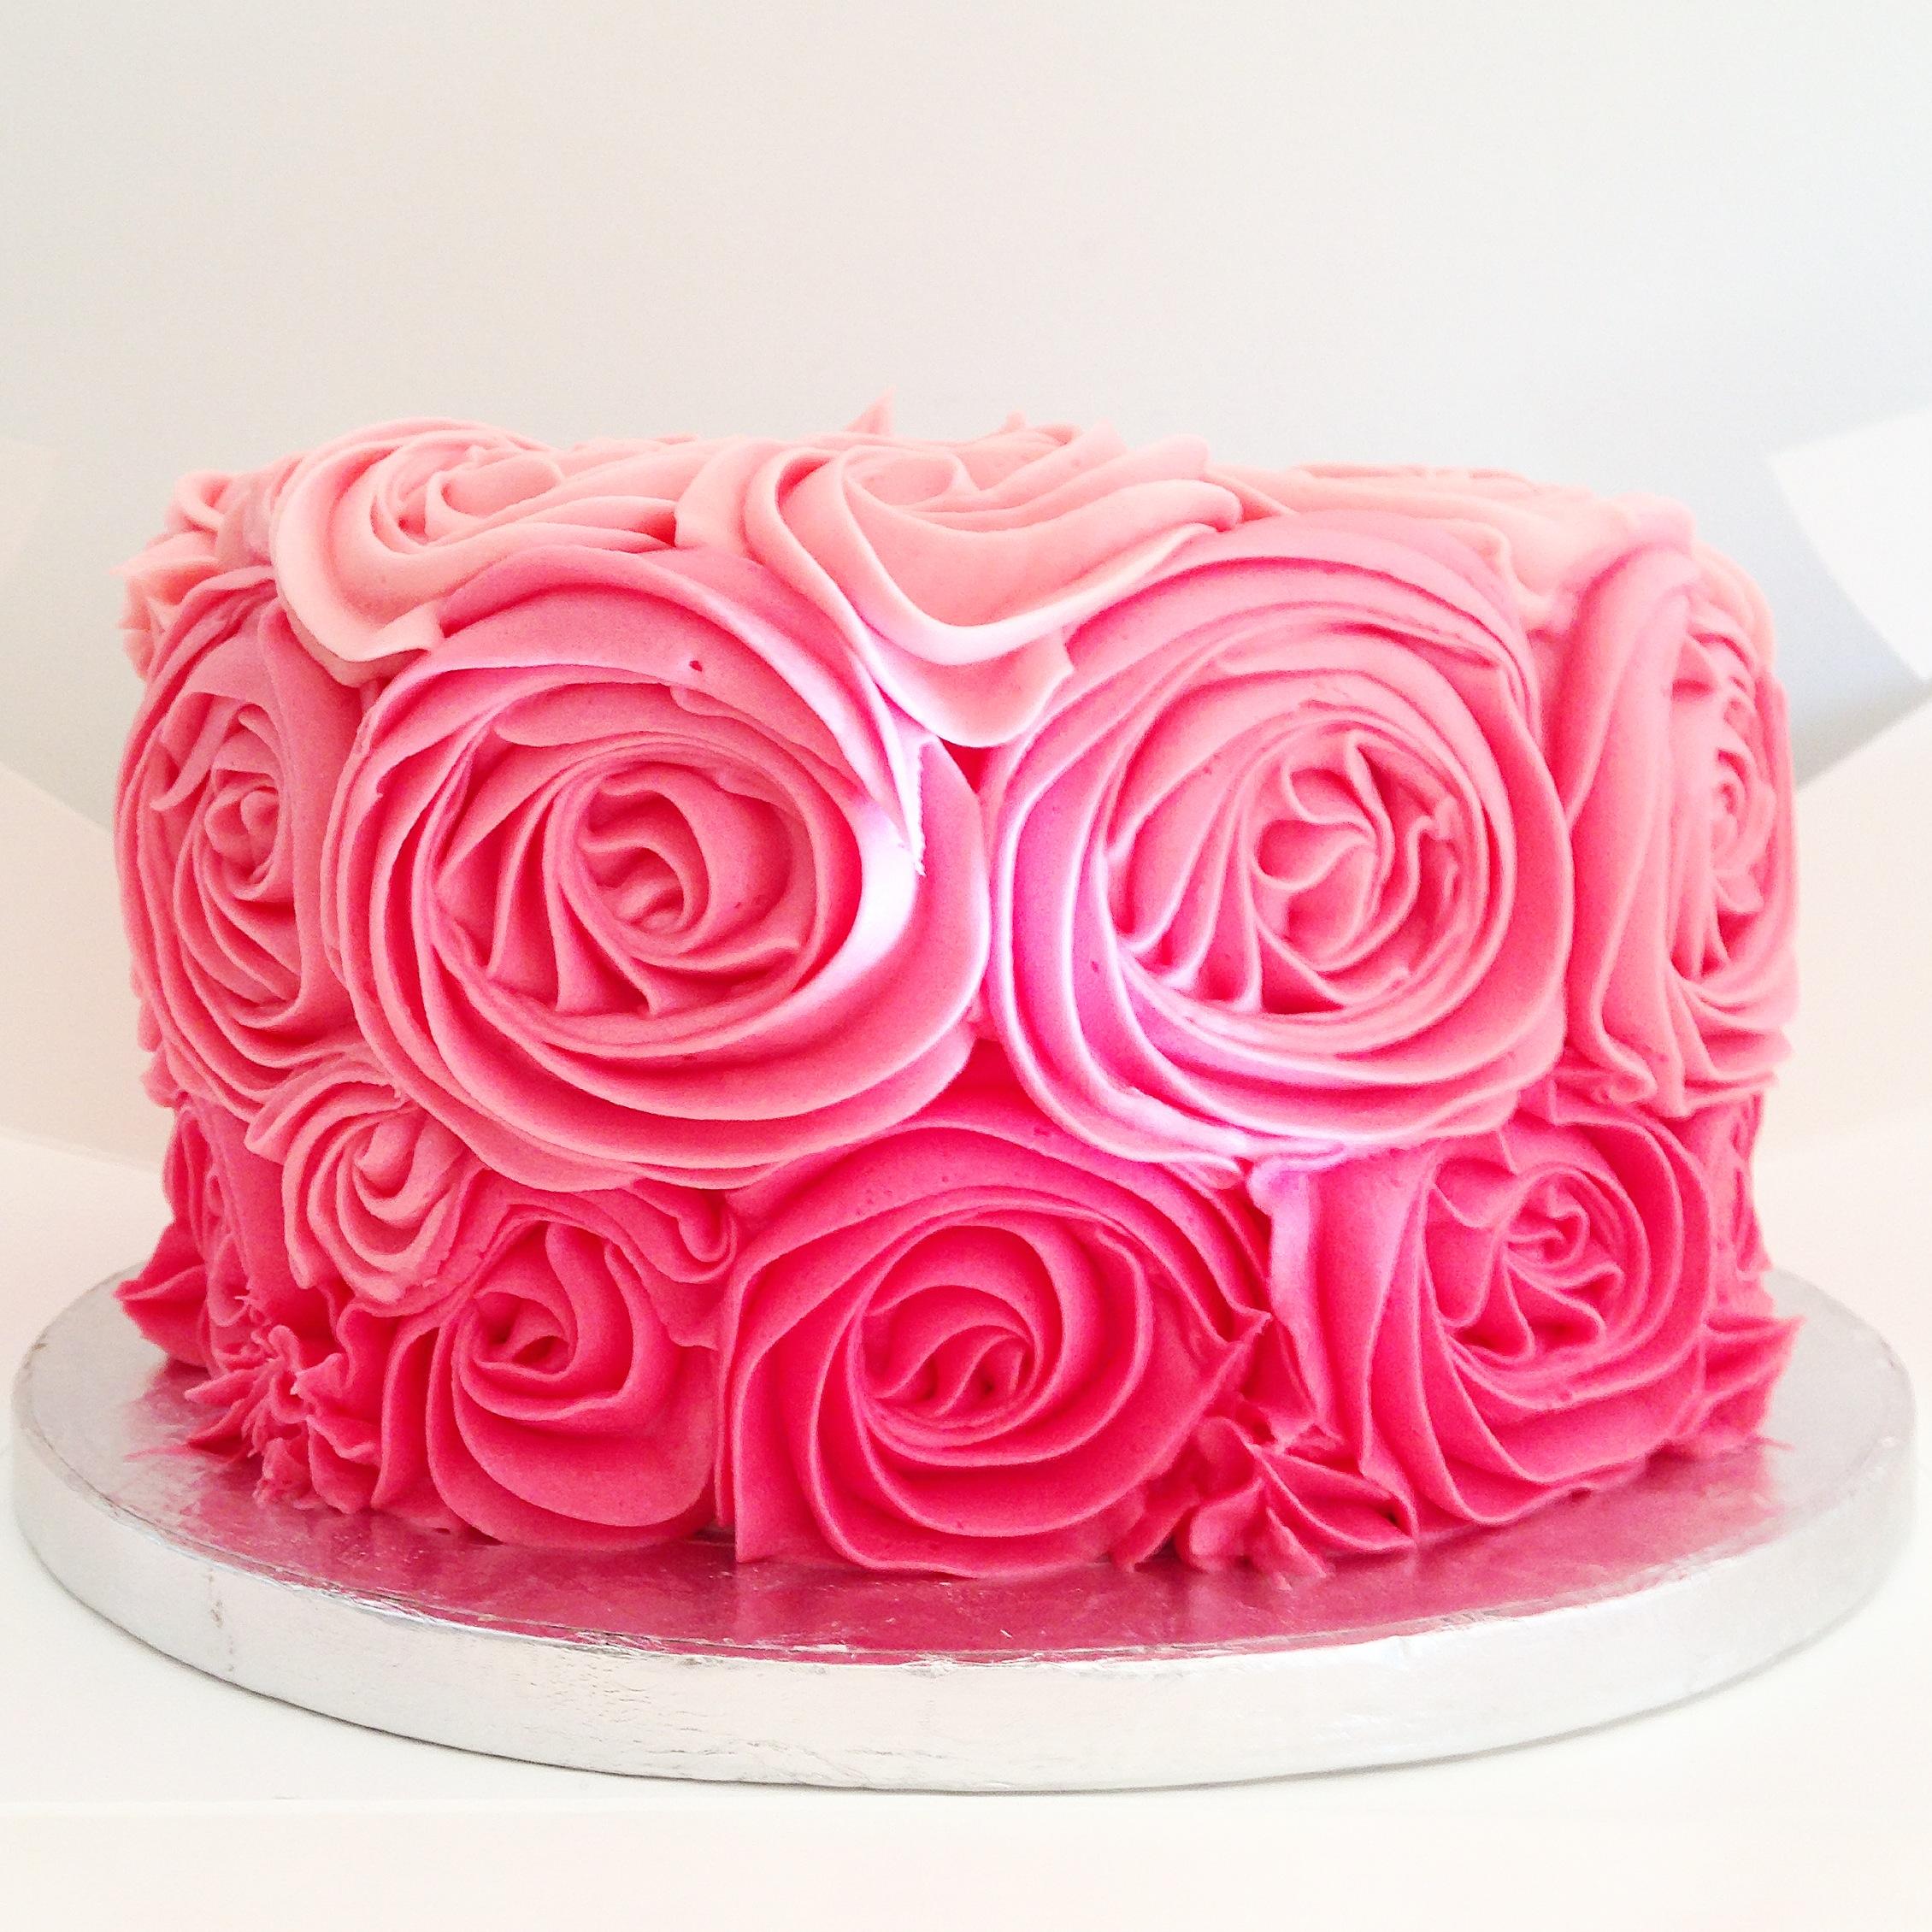 Baby S Smash Cake Beautiful Rosette Cake Decorating With